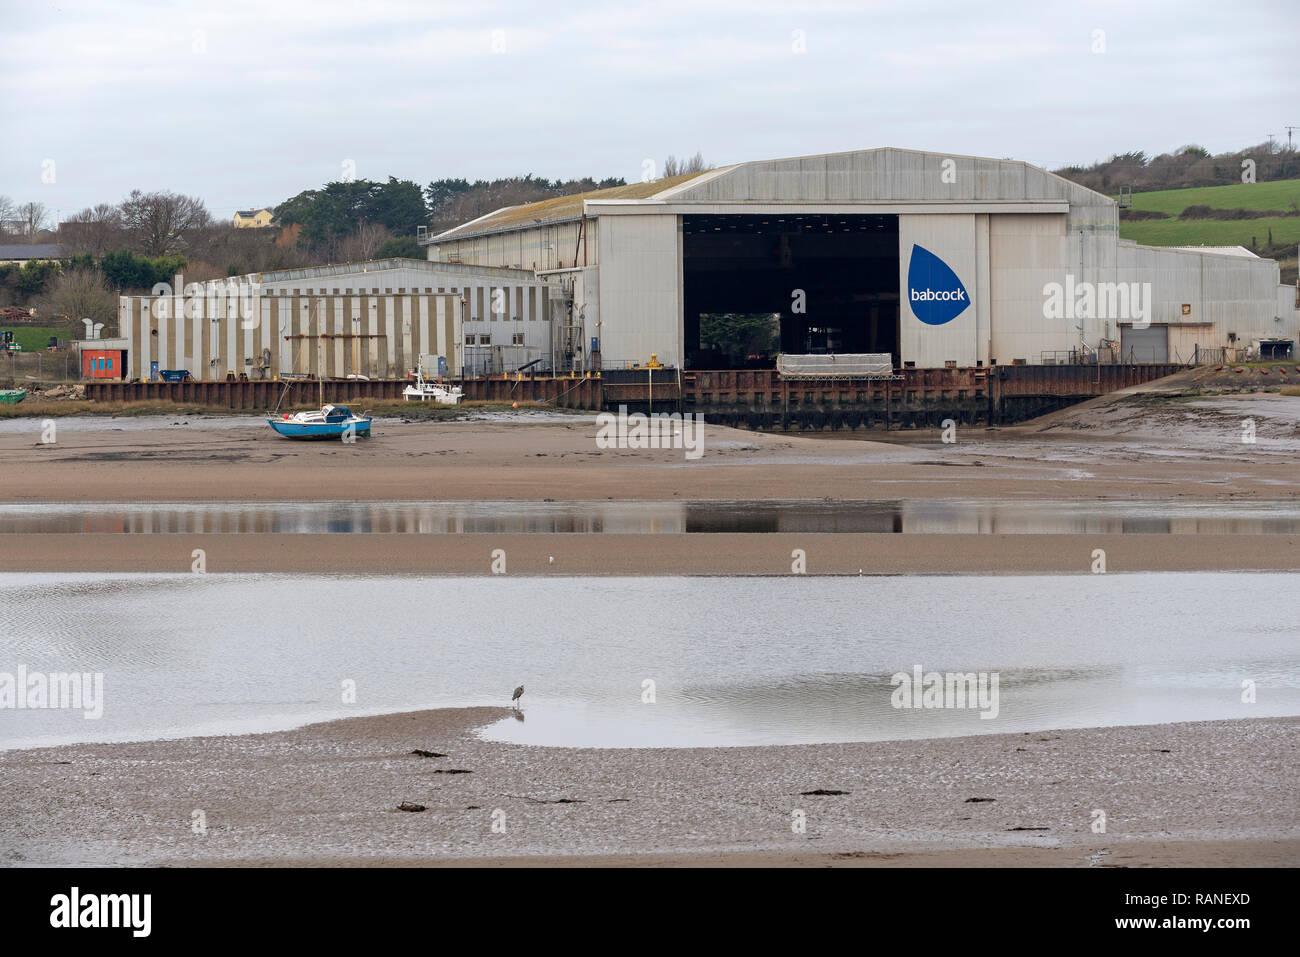 The Babcock international Group Marine Division shipyard on the River Torridge, at Appledore, North Devon, England, UK Stock Photo